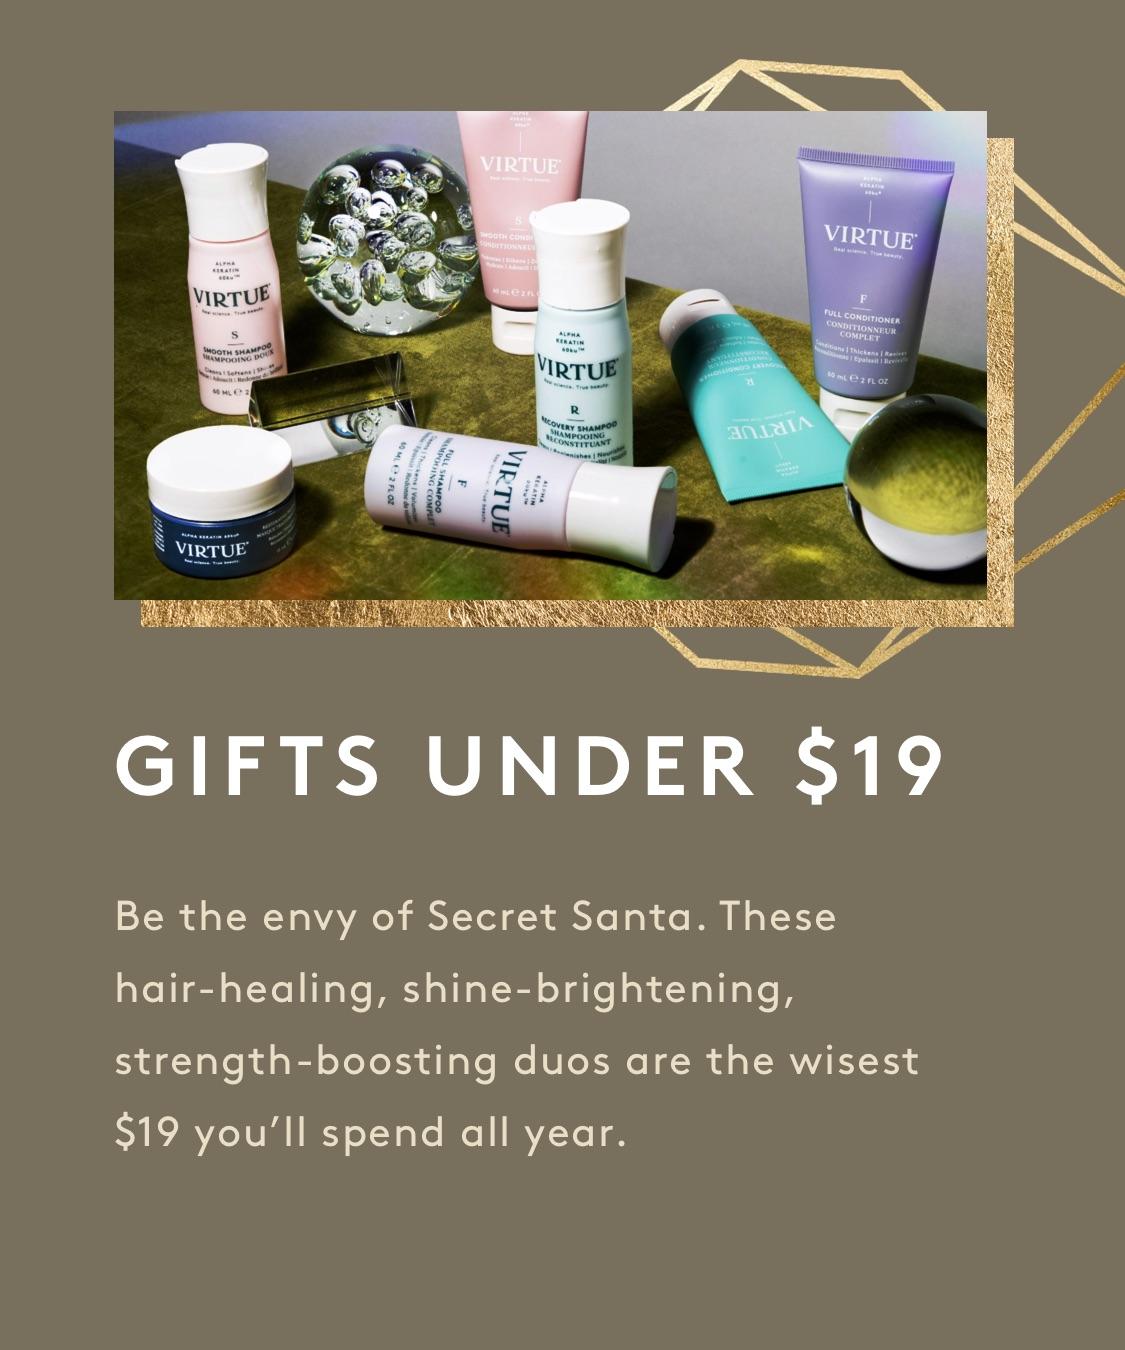 Gifts Under $19